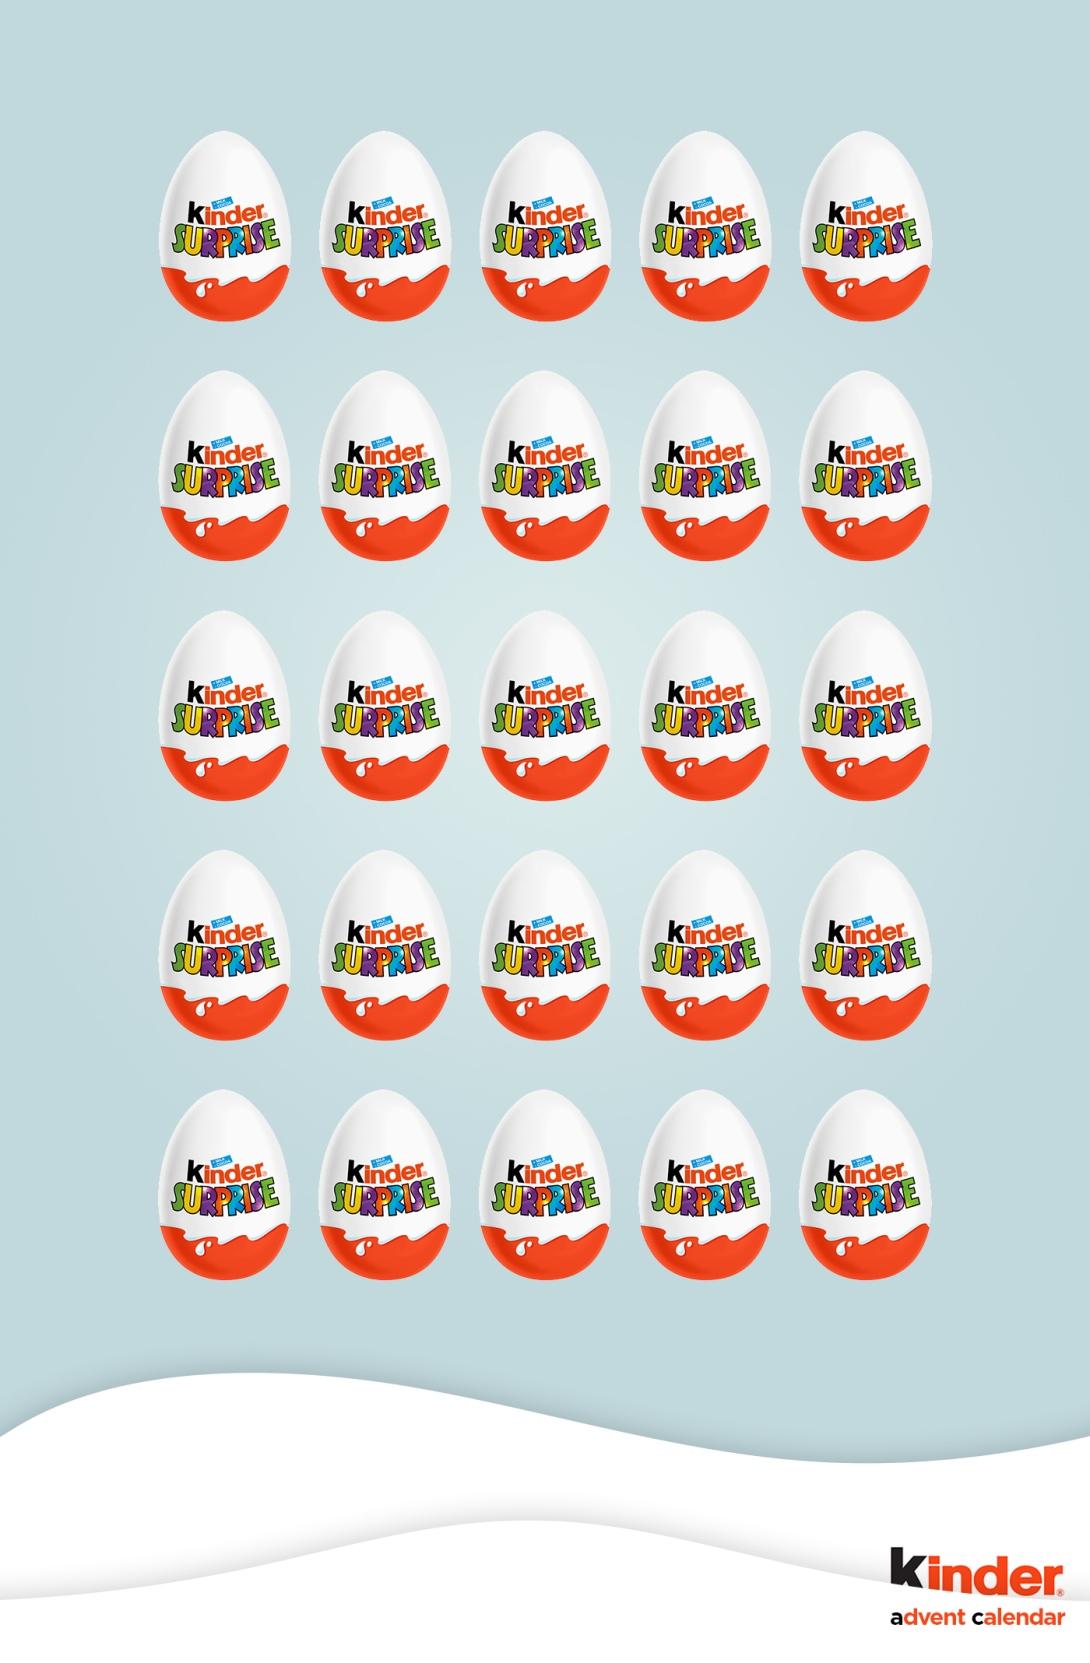 advertising idea for advent calendars - kinder surprise